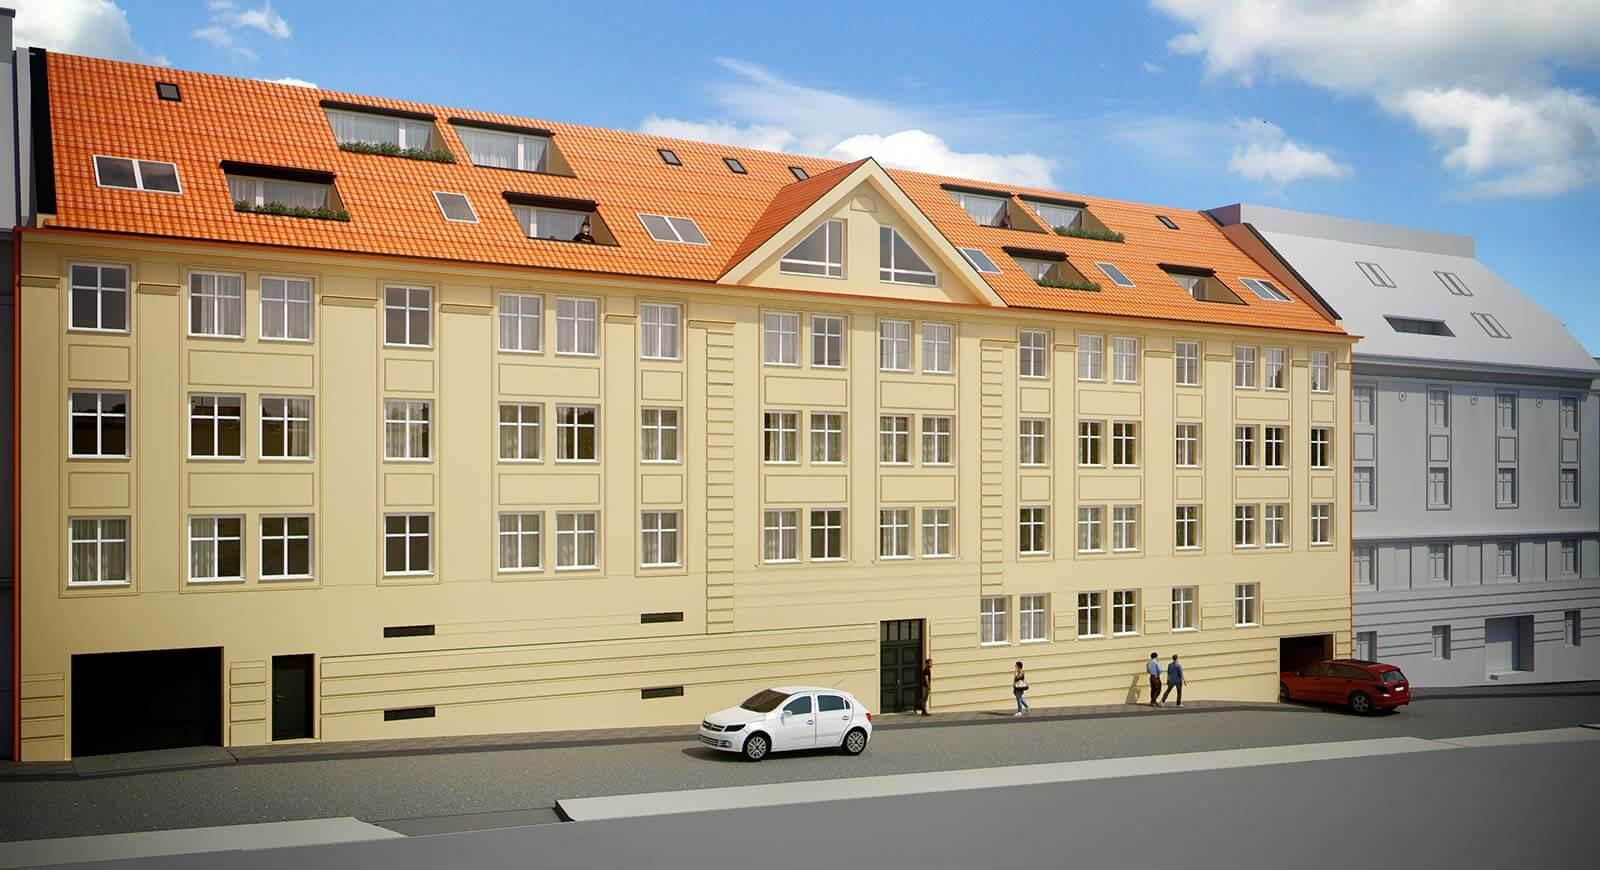 Novostavba 4 izbový byt, širšie centrum v Bratislave, Beskydská ulica, 90,37m2, balkón 4,5m2, štandard.-4